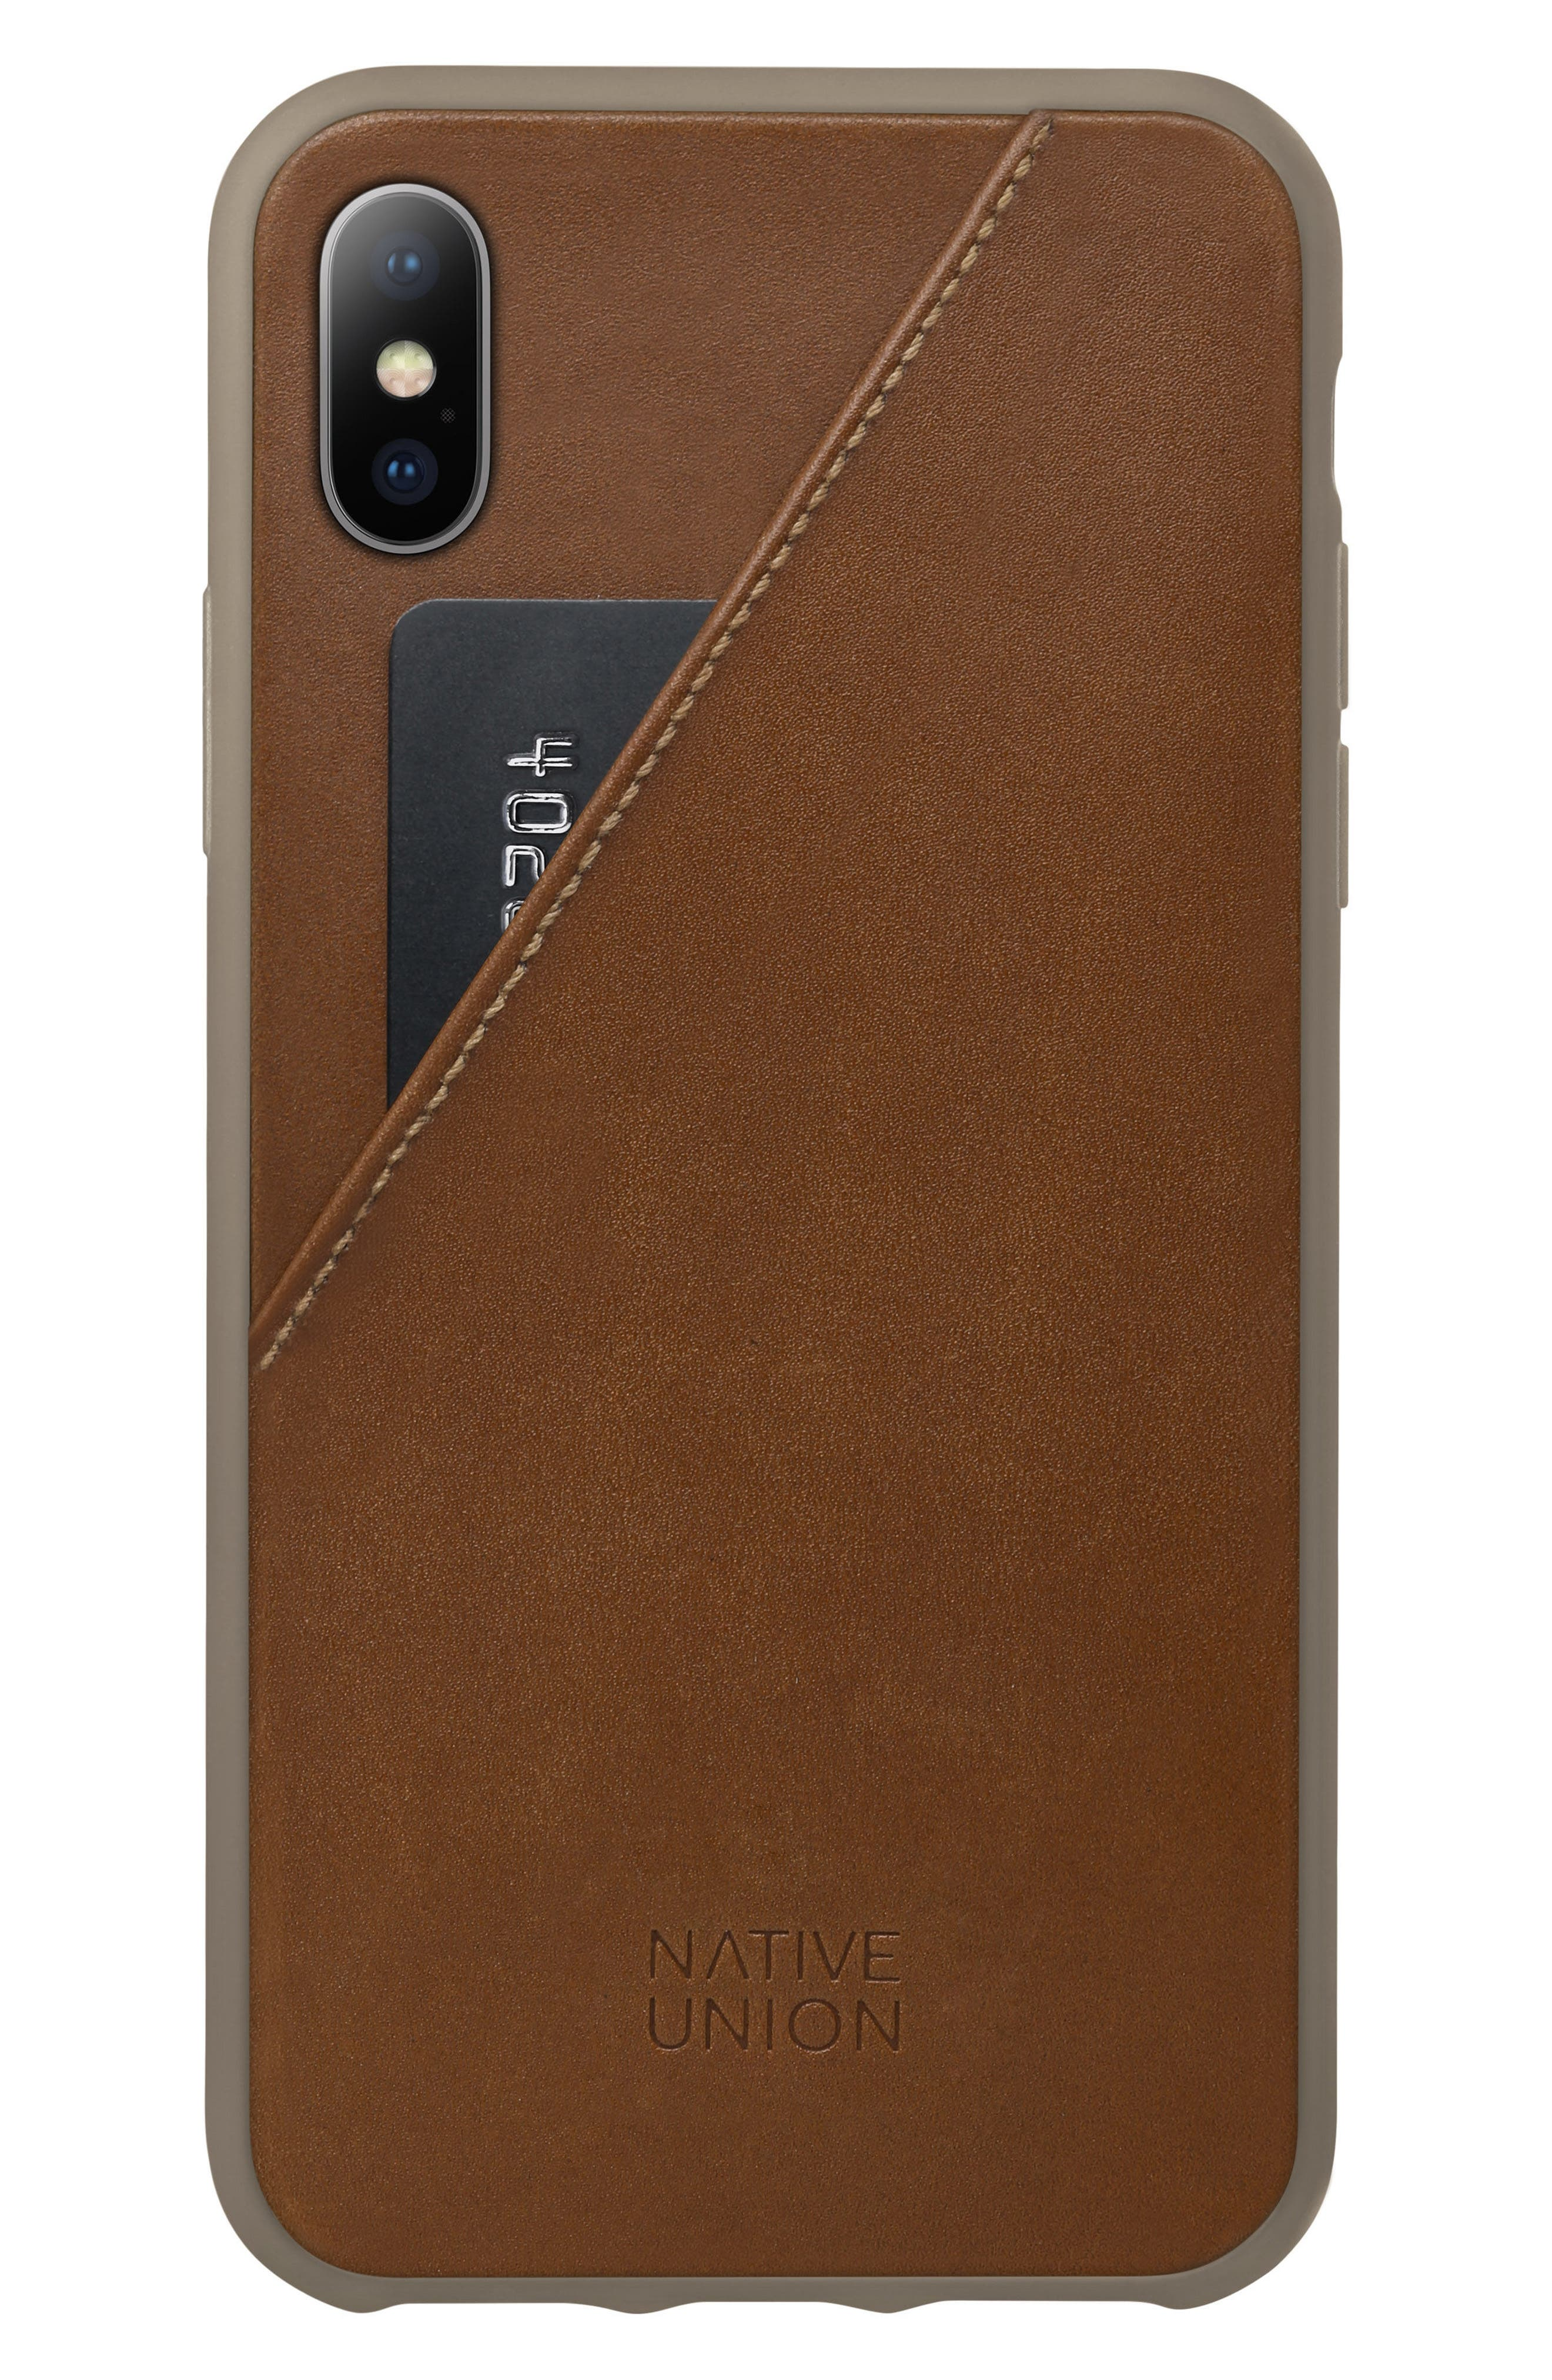 Native Union CLIC Card iPhone X Case